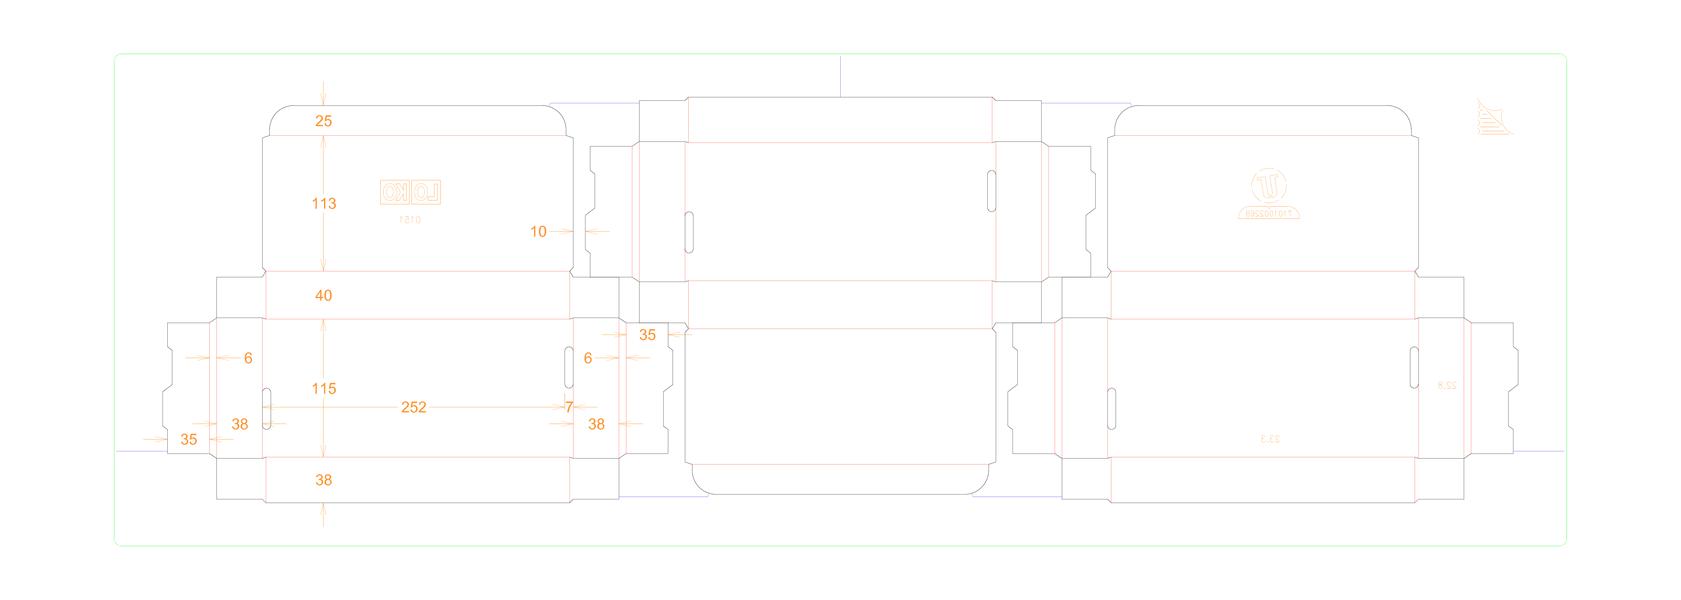 151 - Vouwdoosje 11 x 24,5 x 3,5 cm.pdf